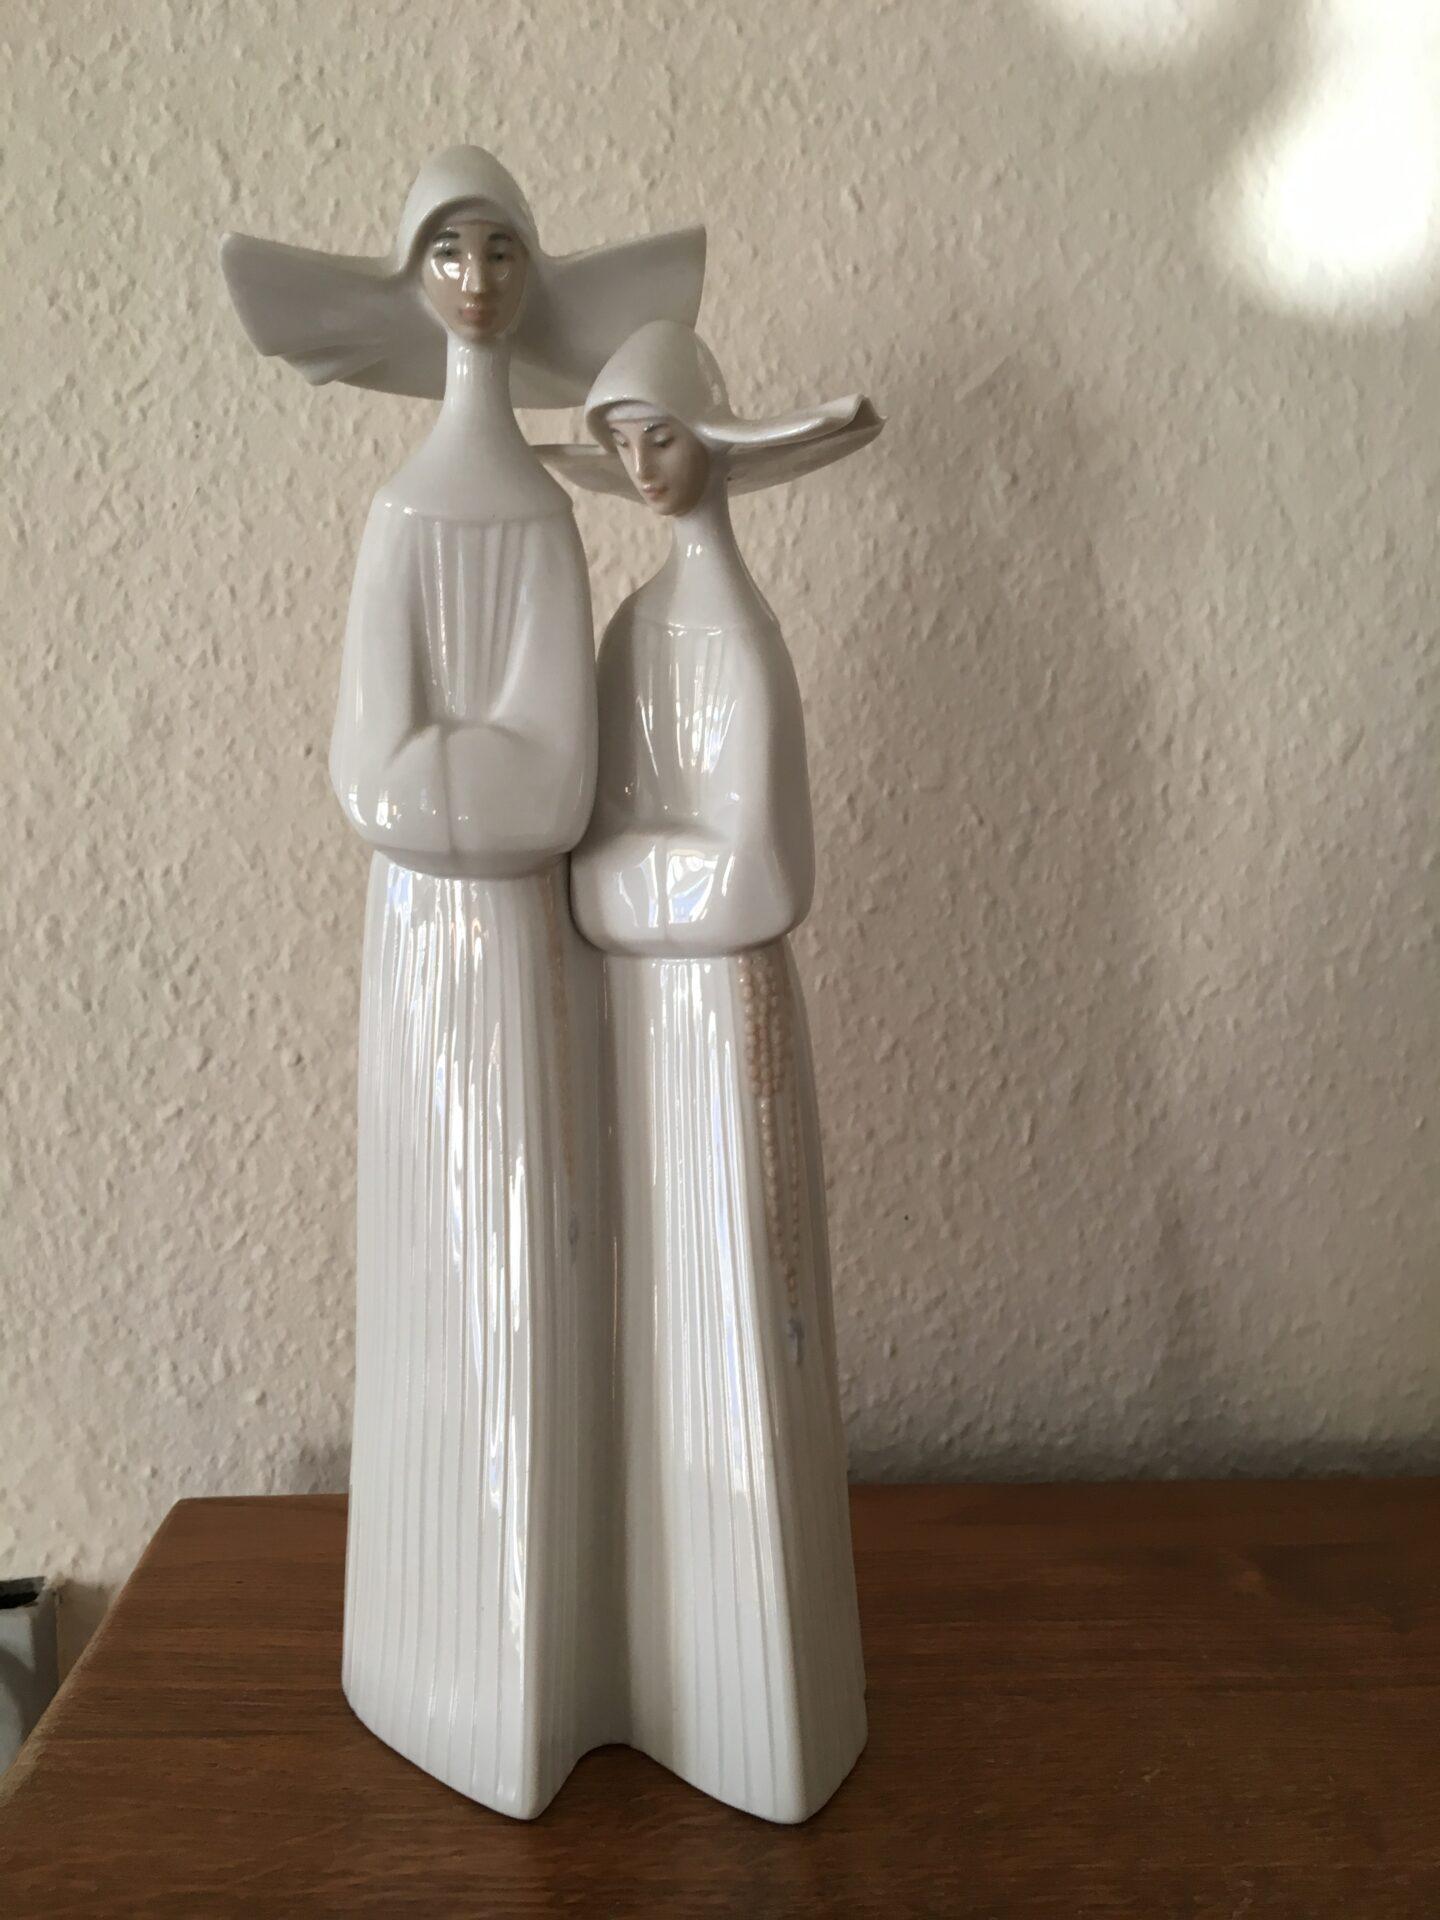 Stor Llado figur, h= 33 cm, pris 500 kr